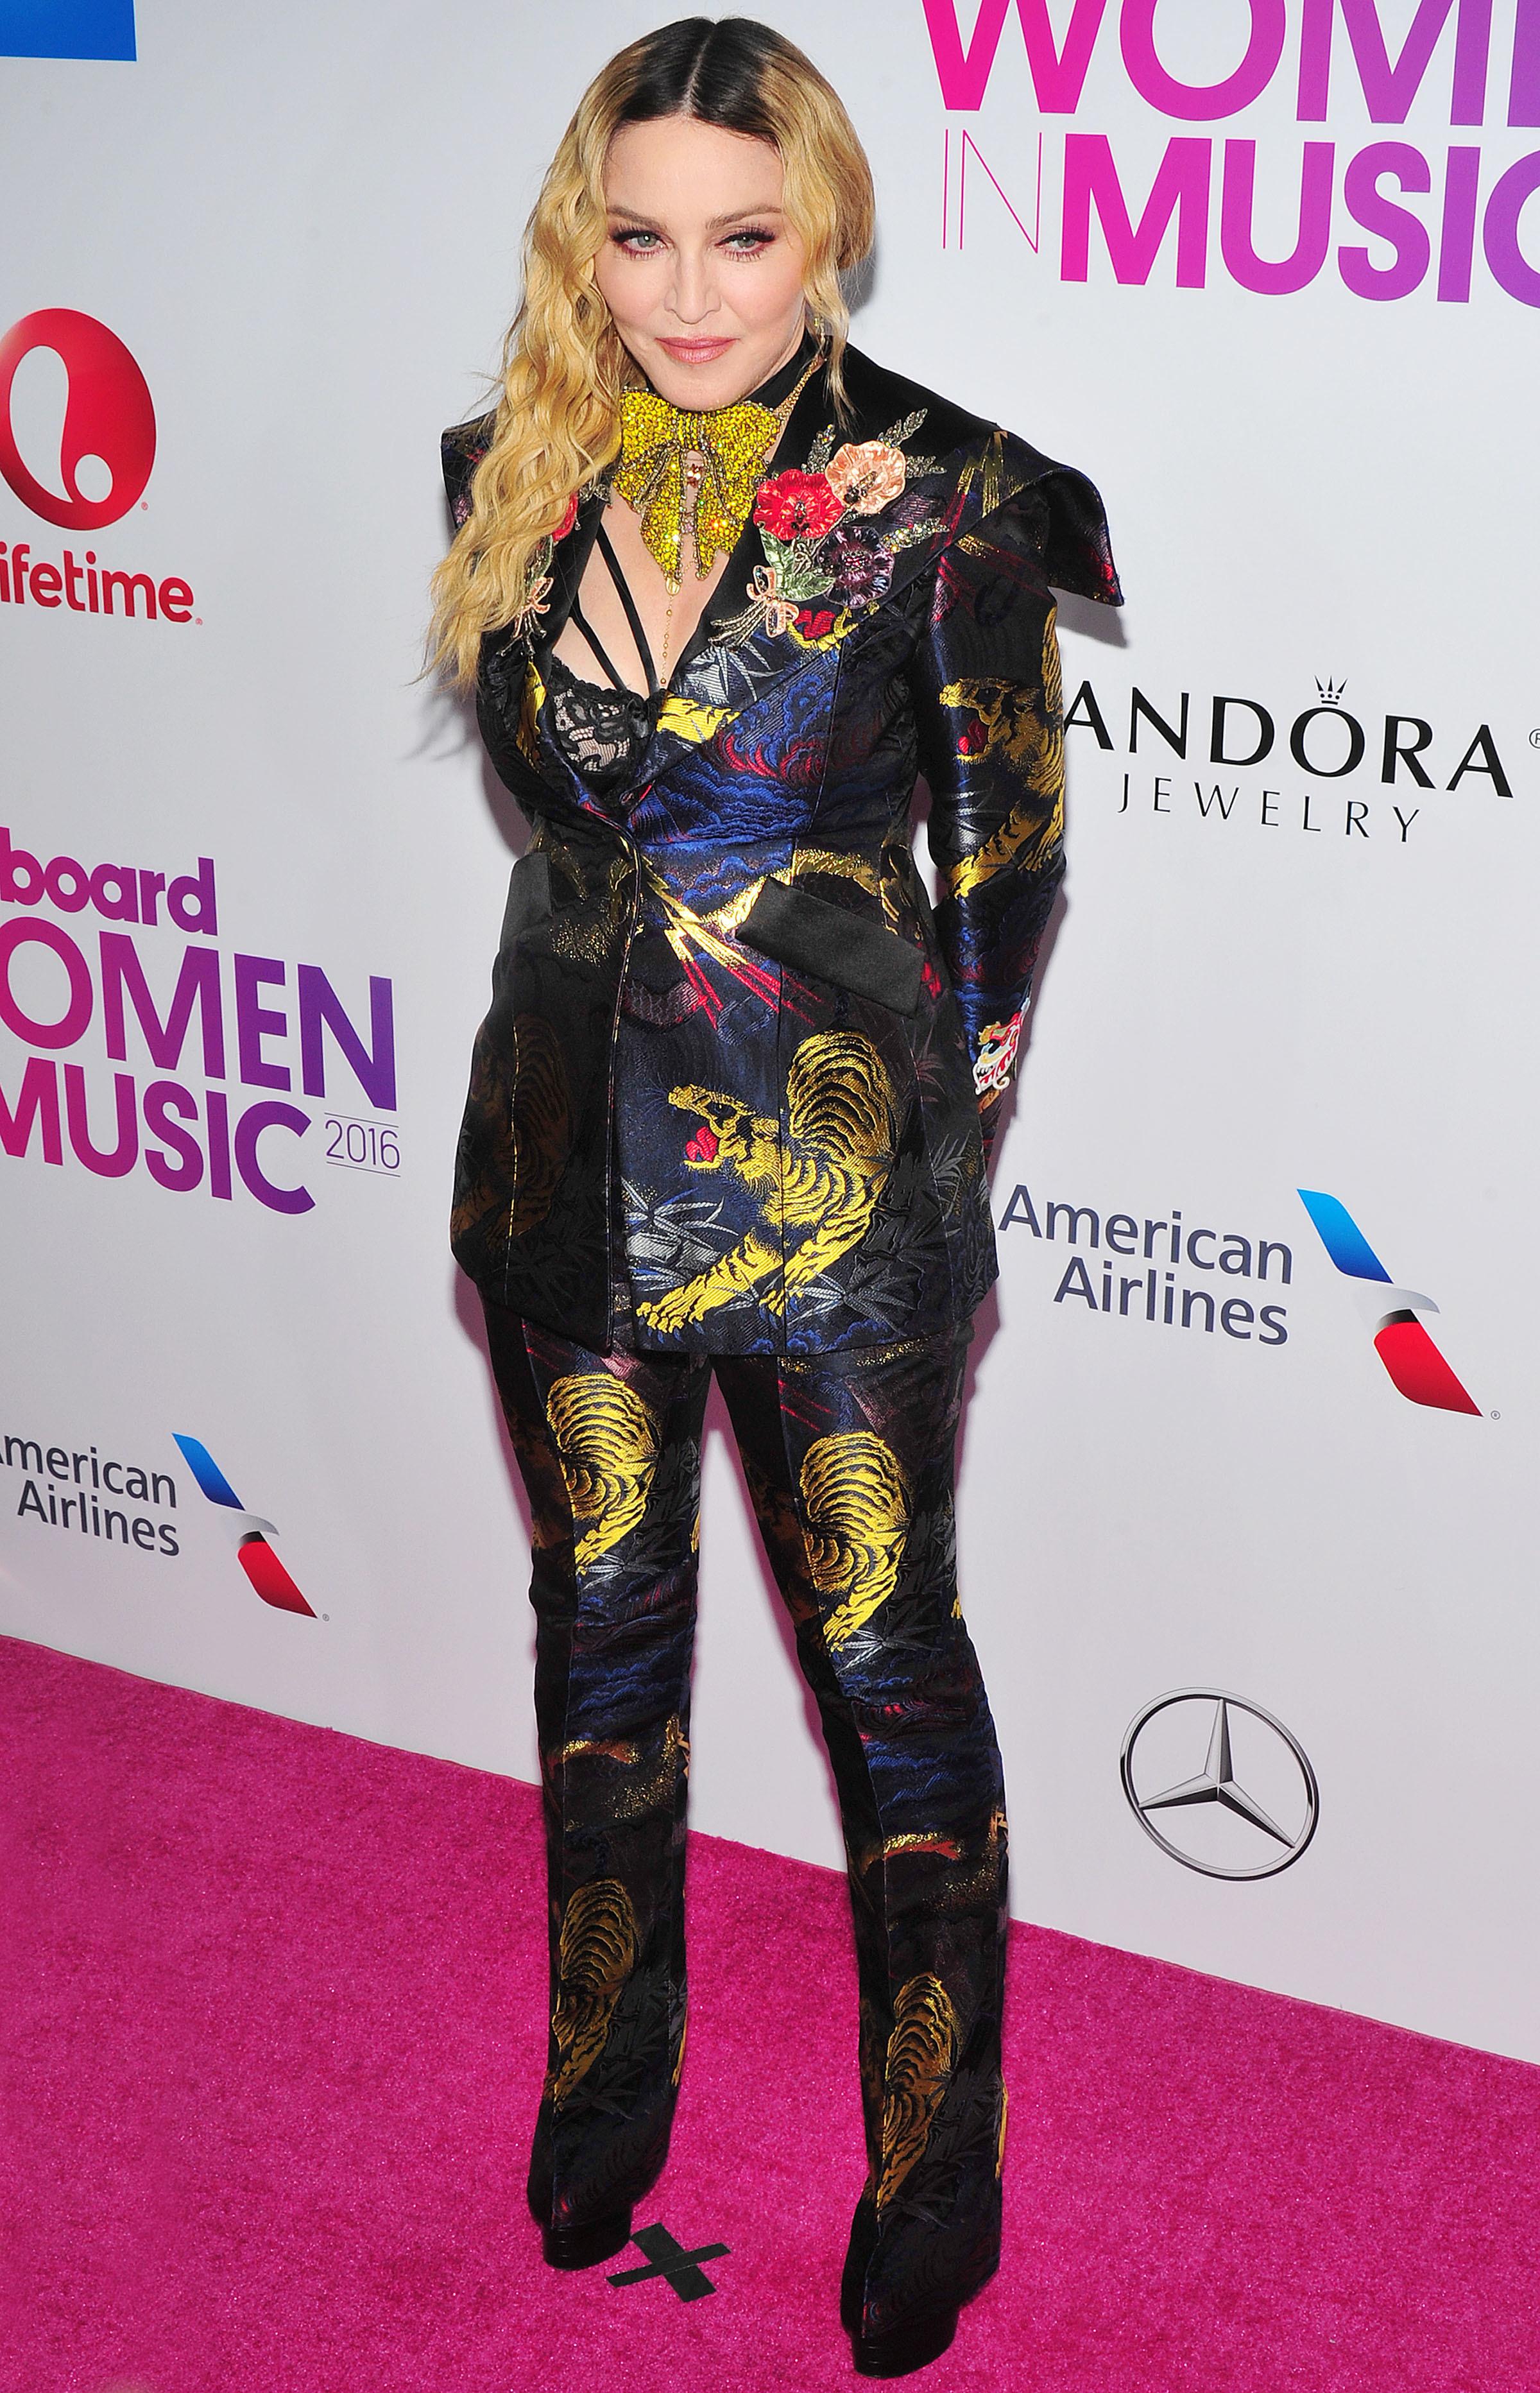 Madonna dismisses adoption rumors in Malawi